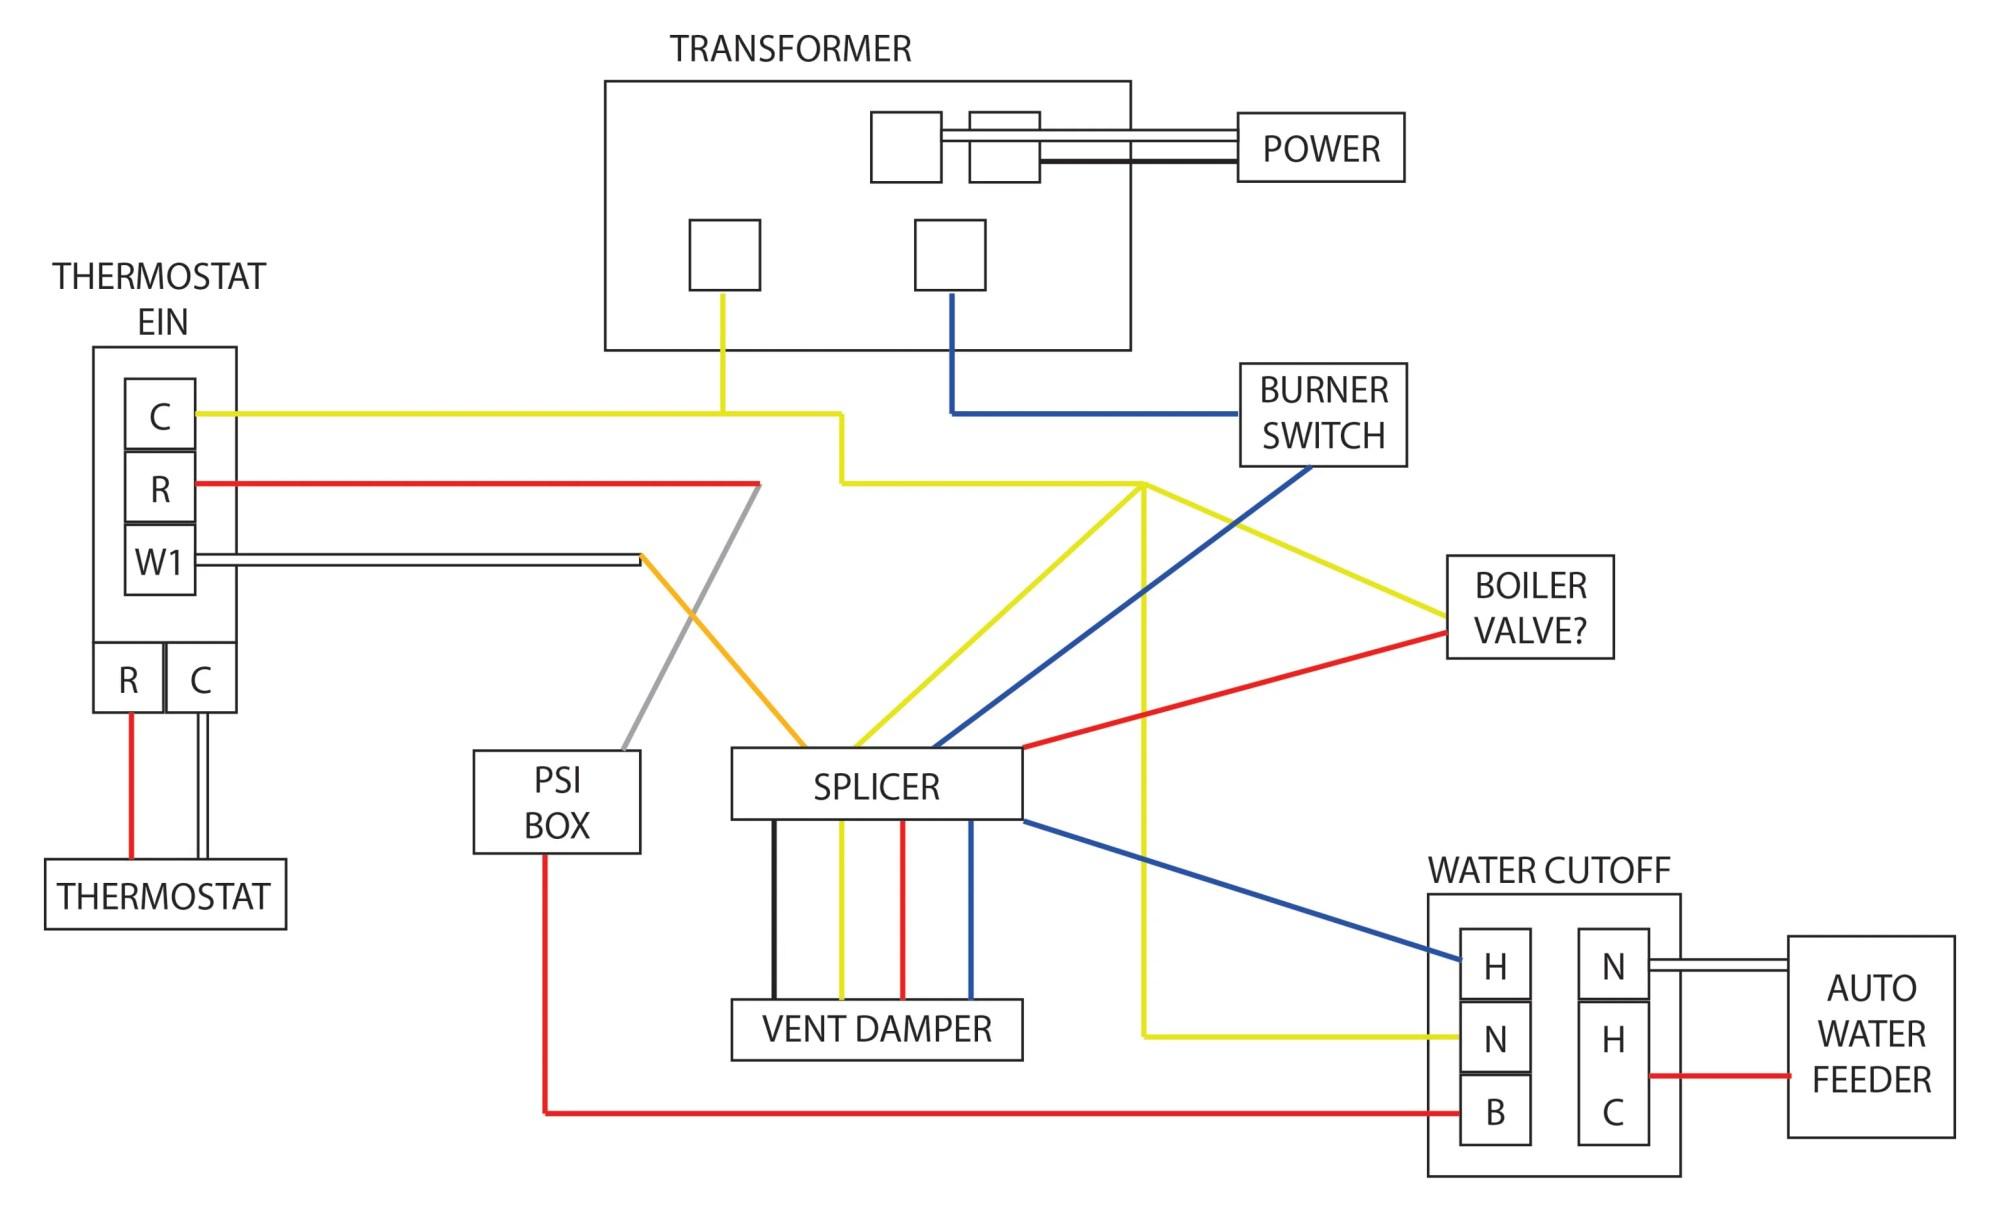 hight resolution of boiler hookup diagrams boiler control basics elsavadorla home hvac systems diagrams fan coil unit central heating wiring diagram